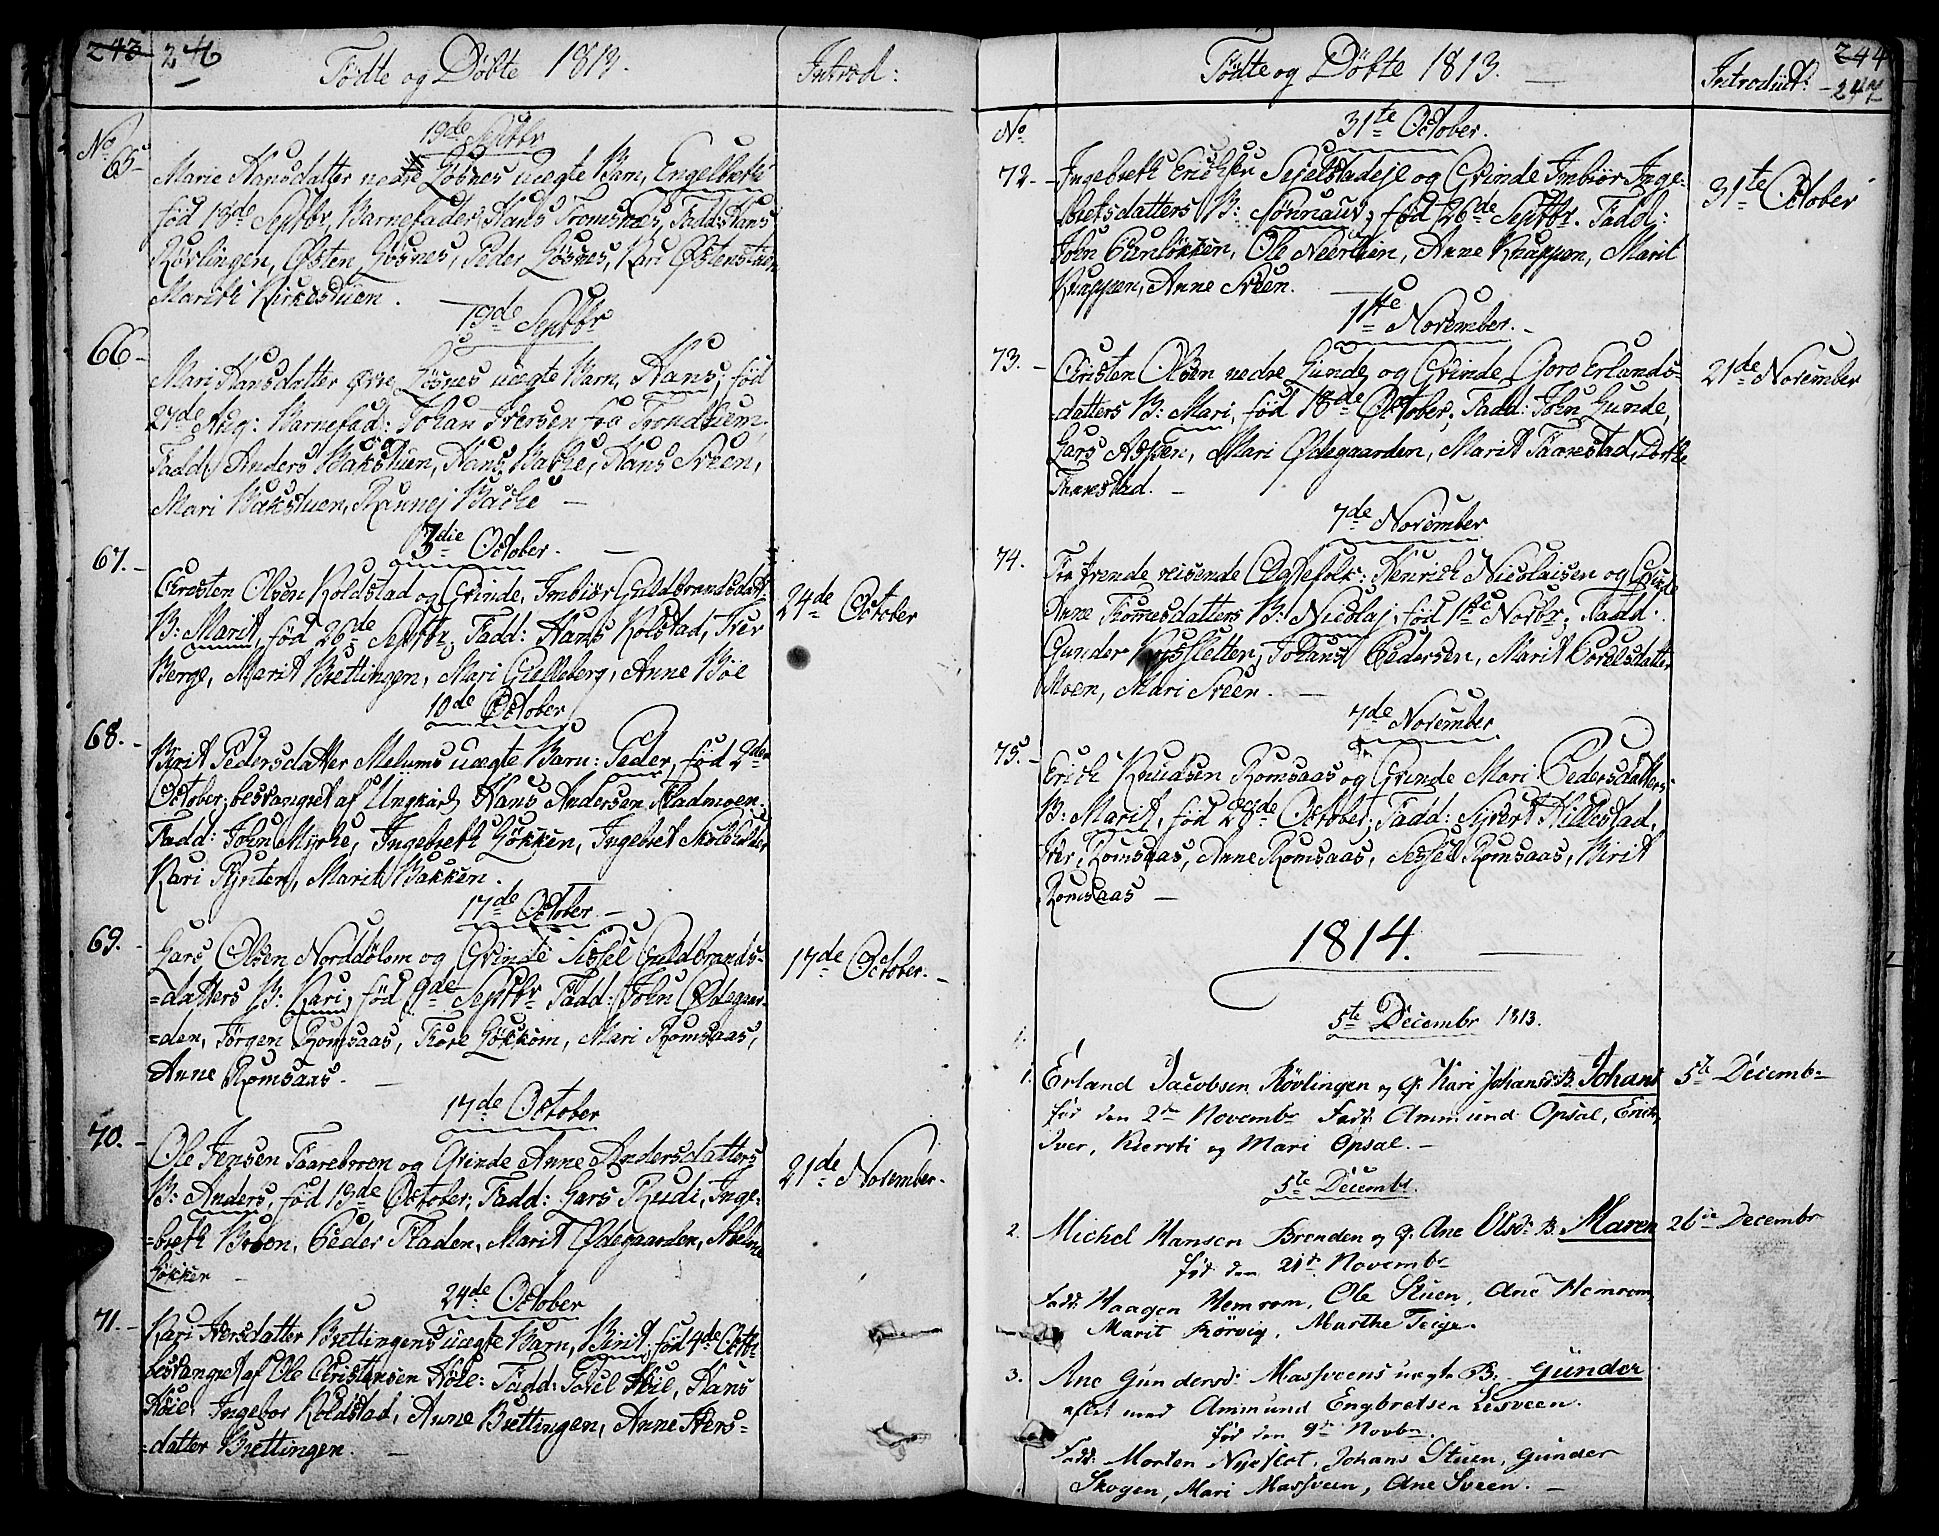 SAH, Ringebu prestekontor, Ministerialbok nr. 3, 1781-1820, s. 246-247